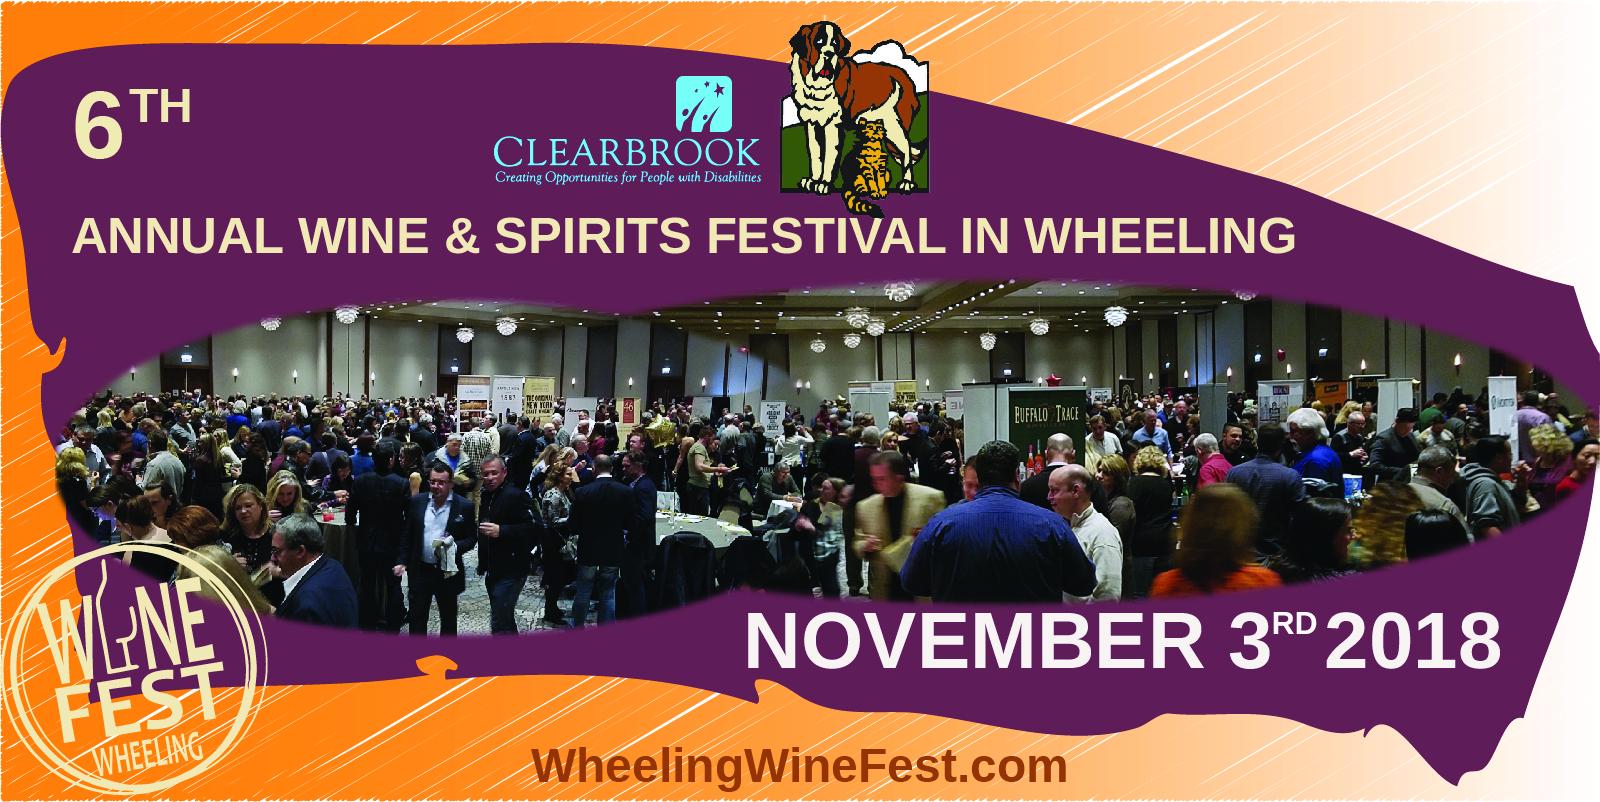 Wheeling Wine & Spirits Festival